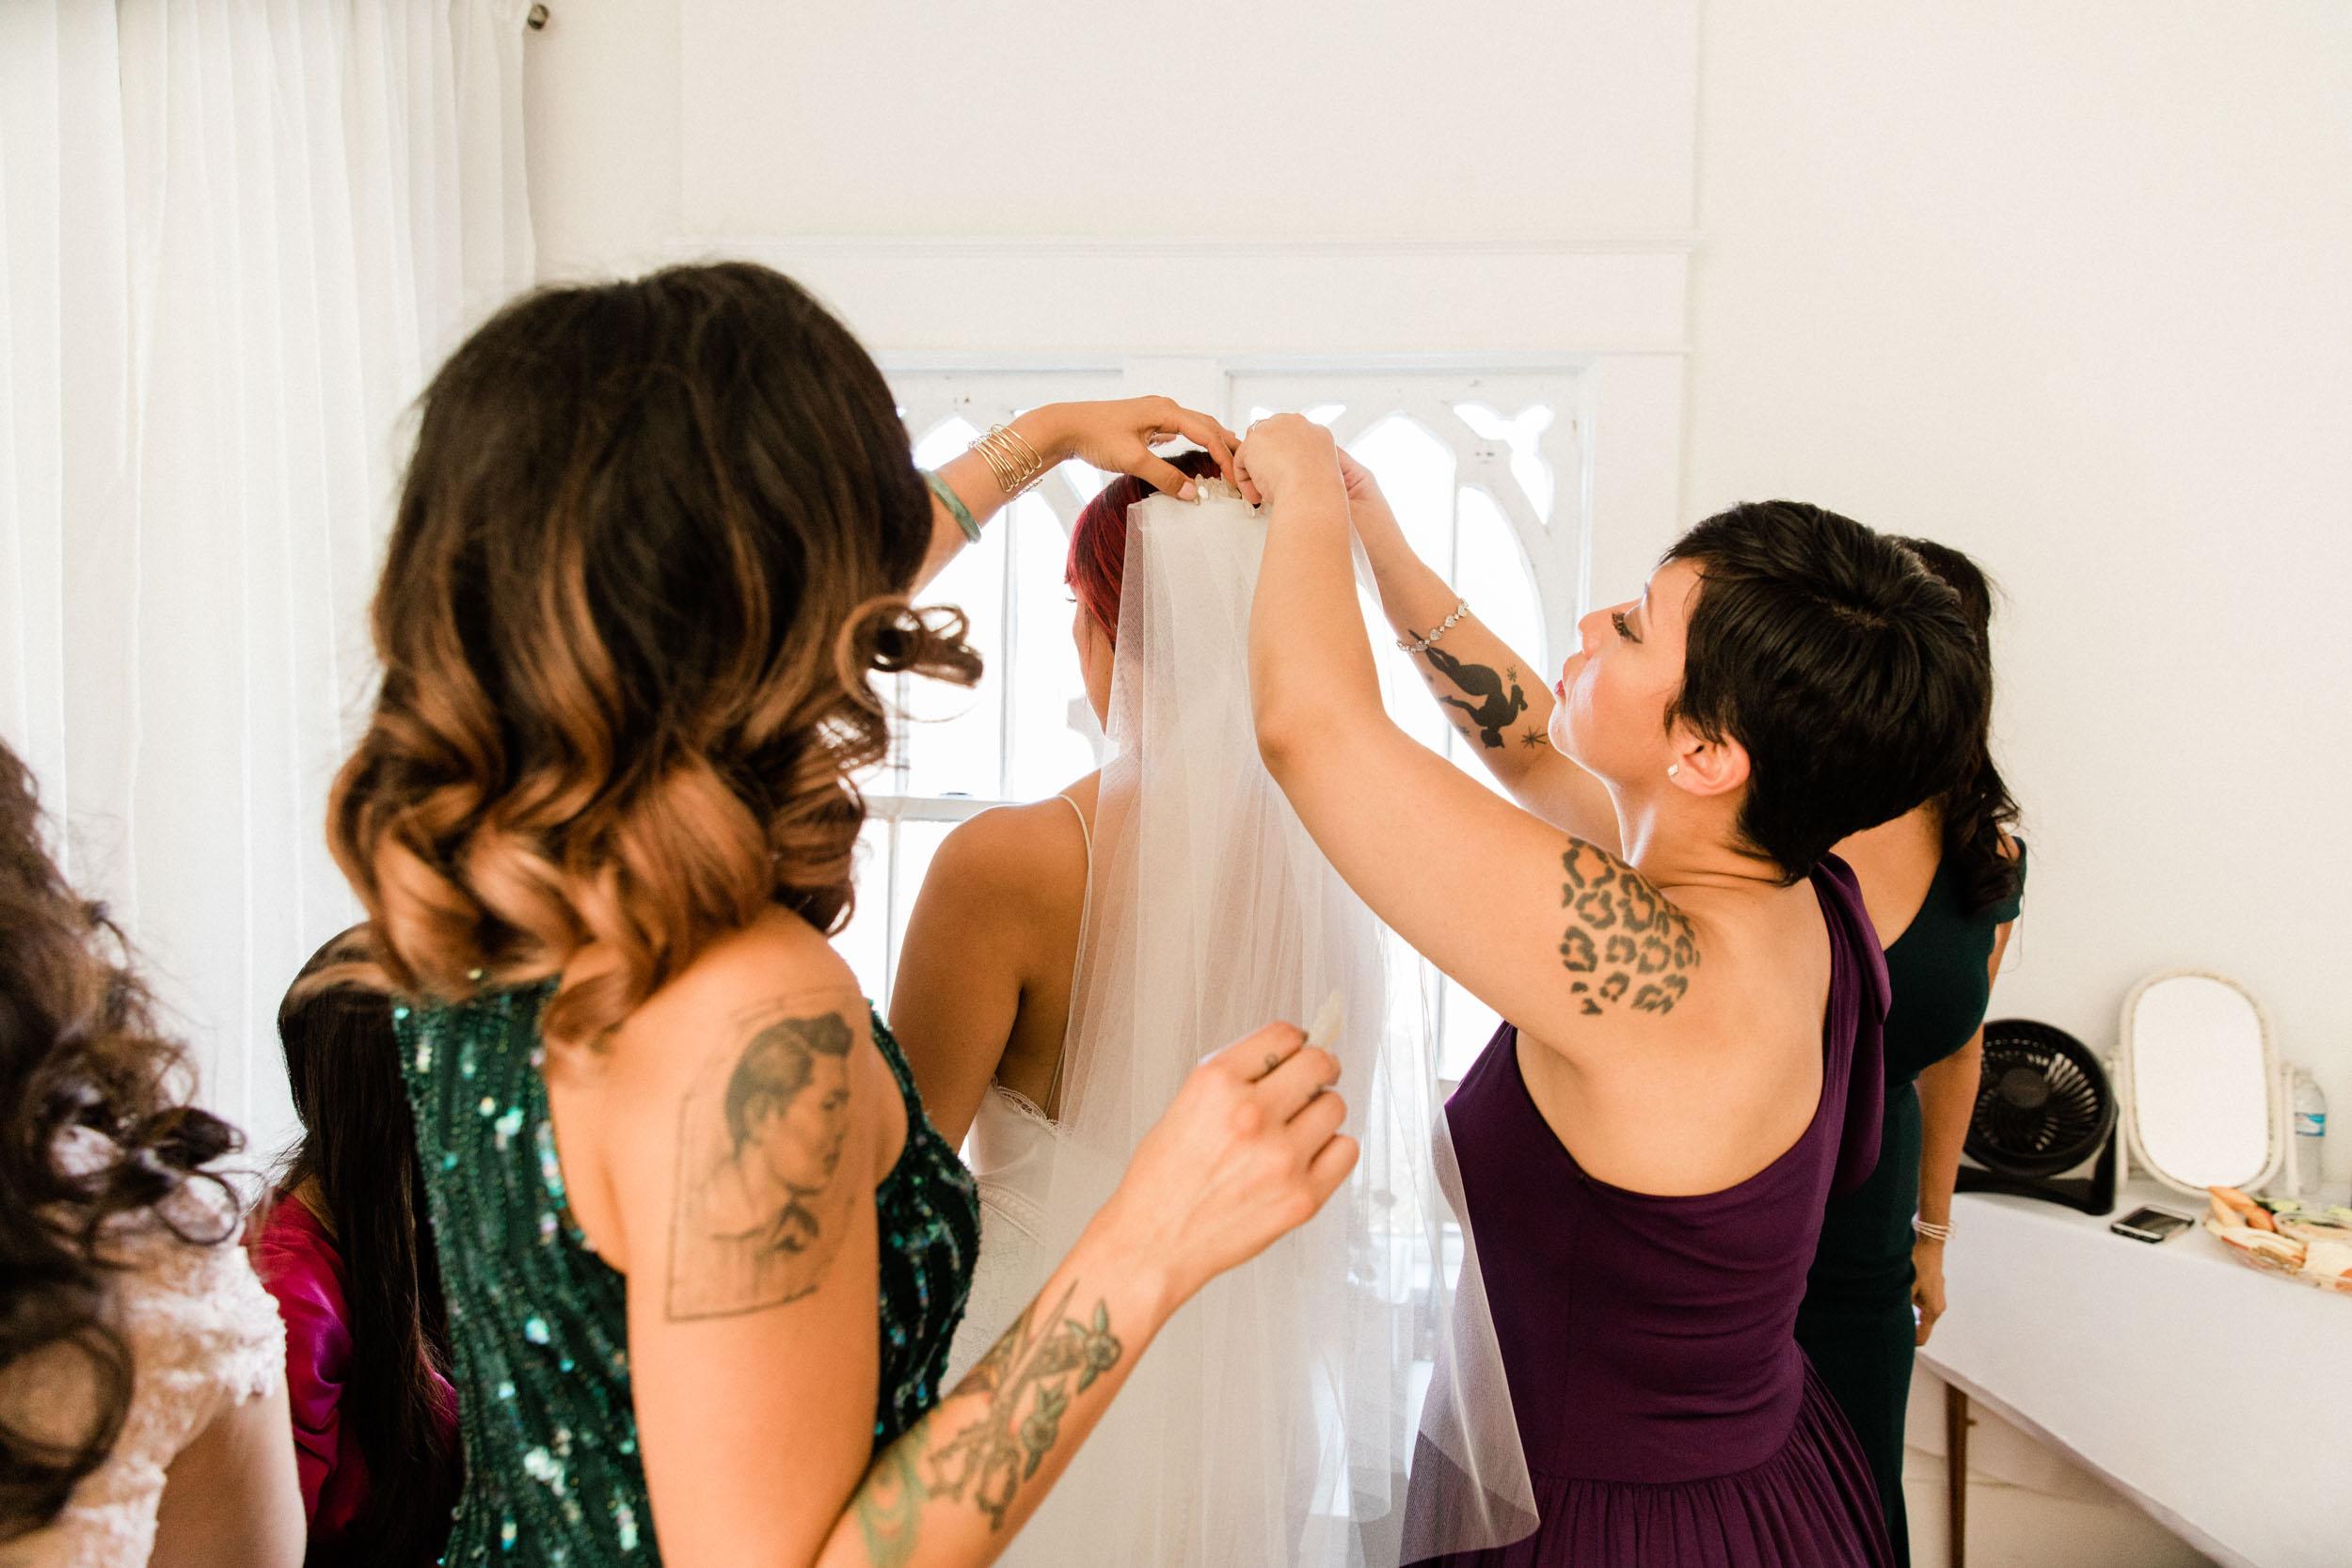 BKM-Photography-Los-Angeles-Highland-Park-York-Manor-Wedding-Photography-0604.jpg